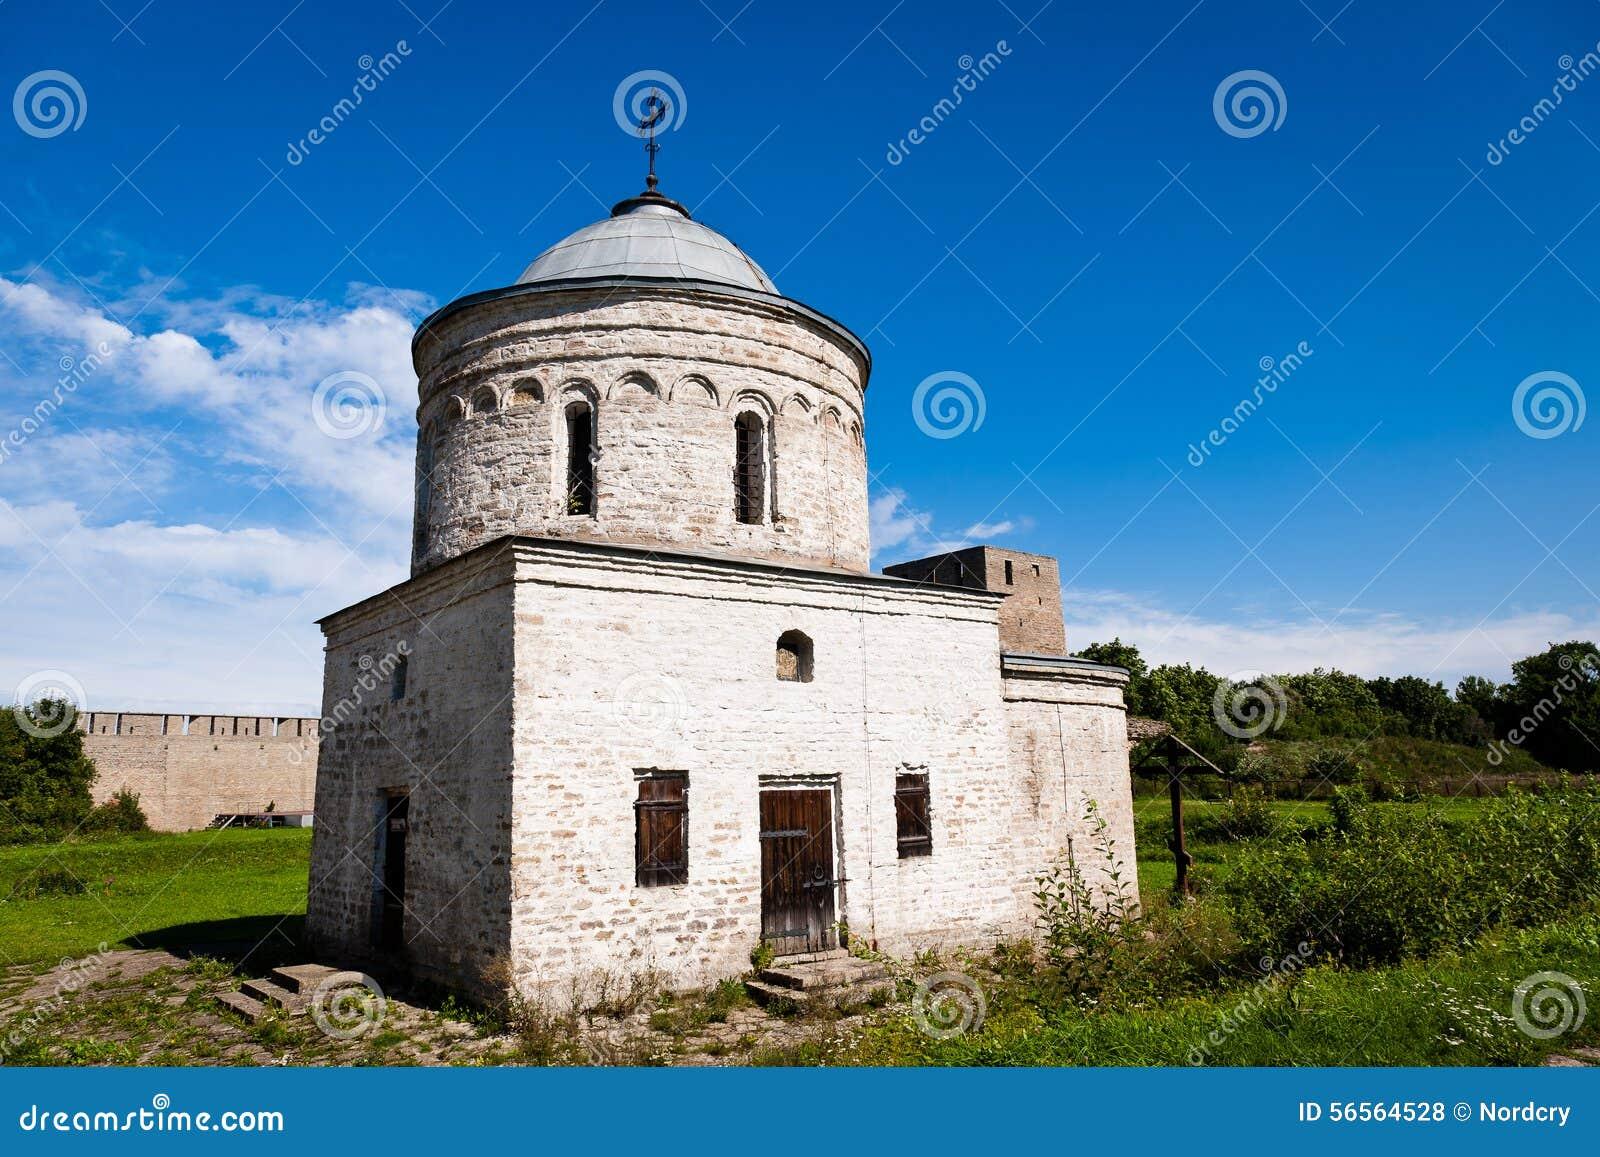 Download Μεσαιωνική εκκλησία ορθοδοξίας στο φρούριο Ivangorod Στοκ Εικόνες - εικόνα από past, παλαιός: 56564528